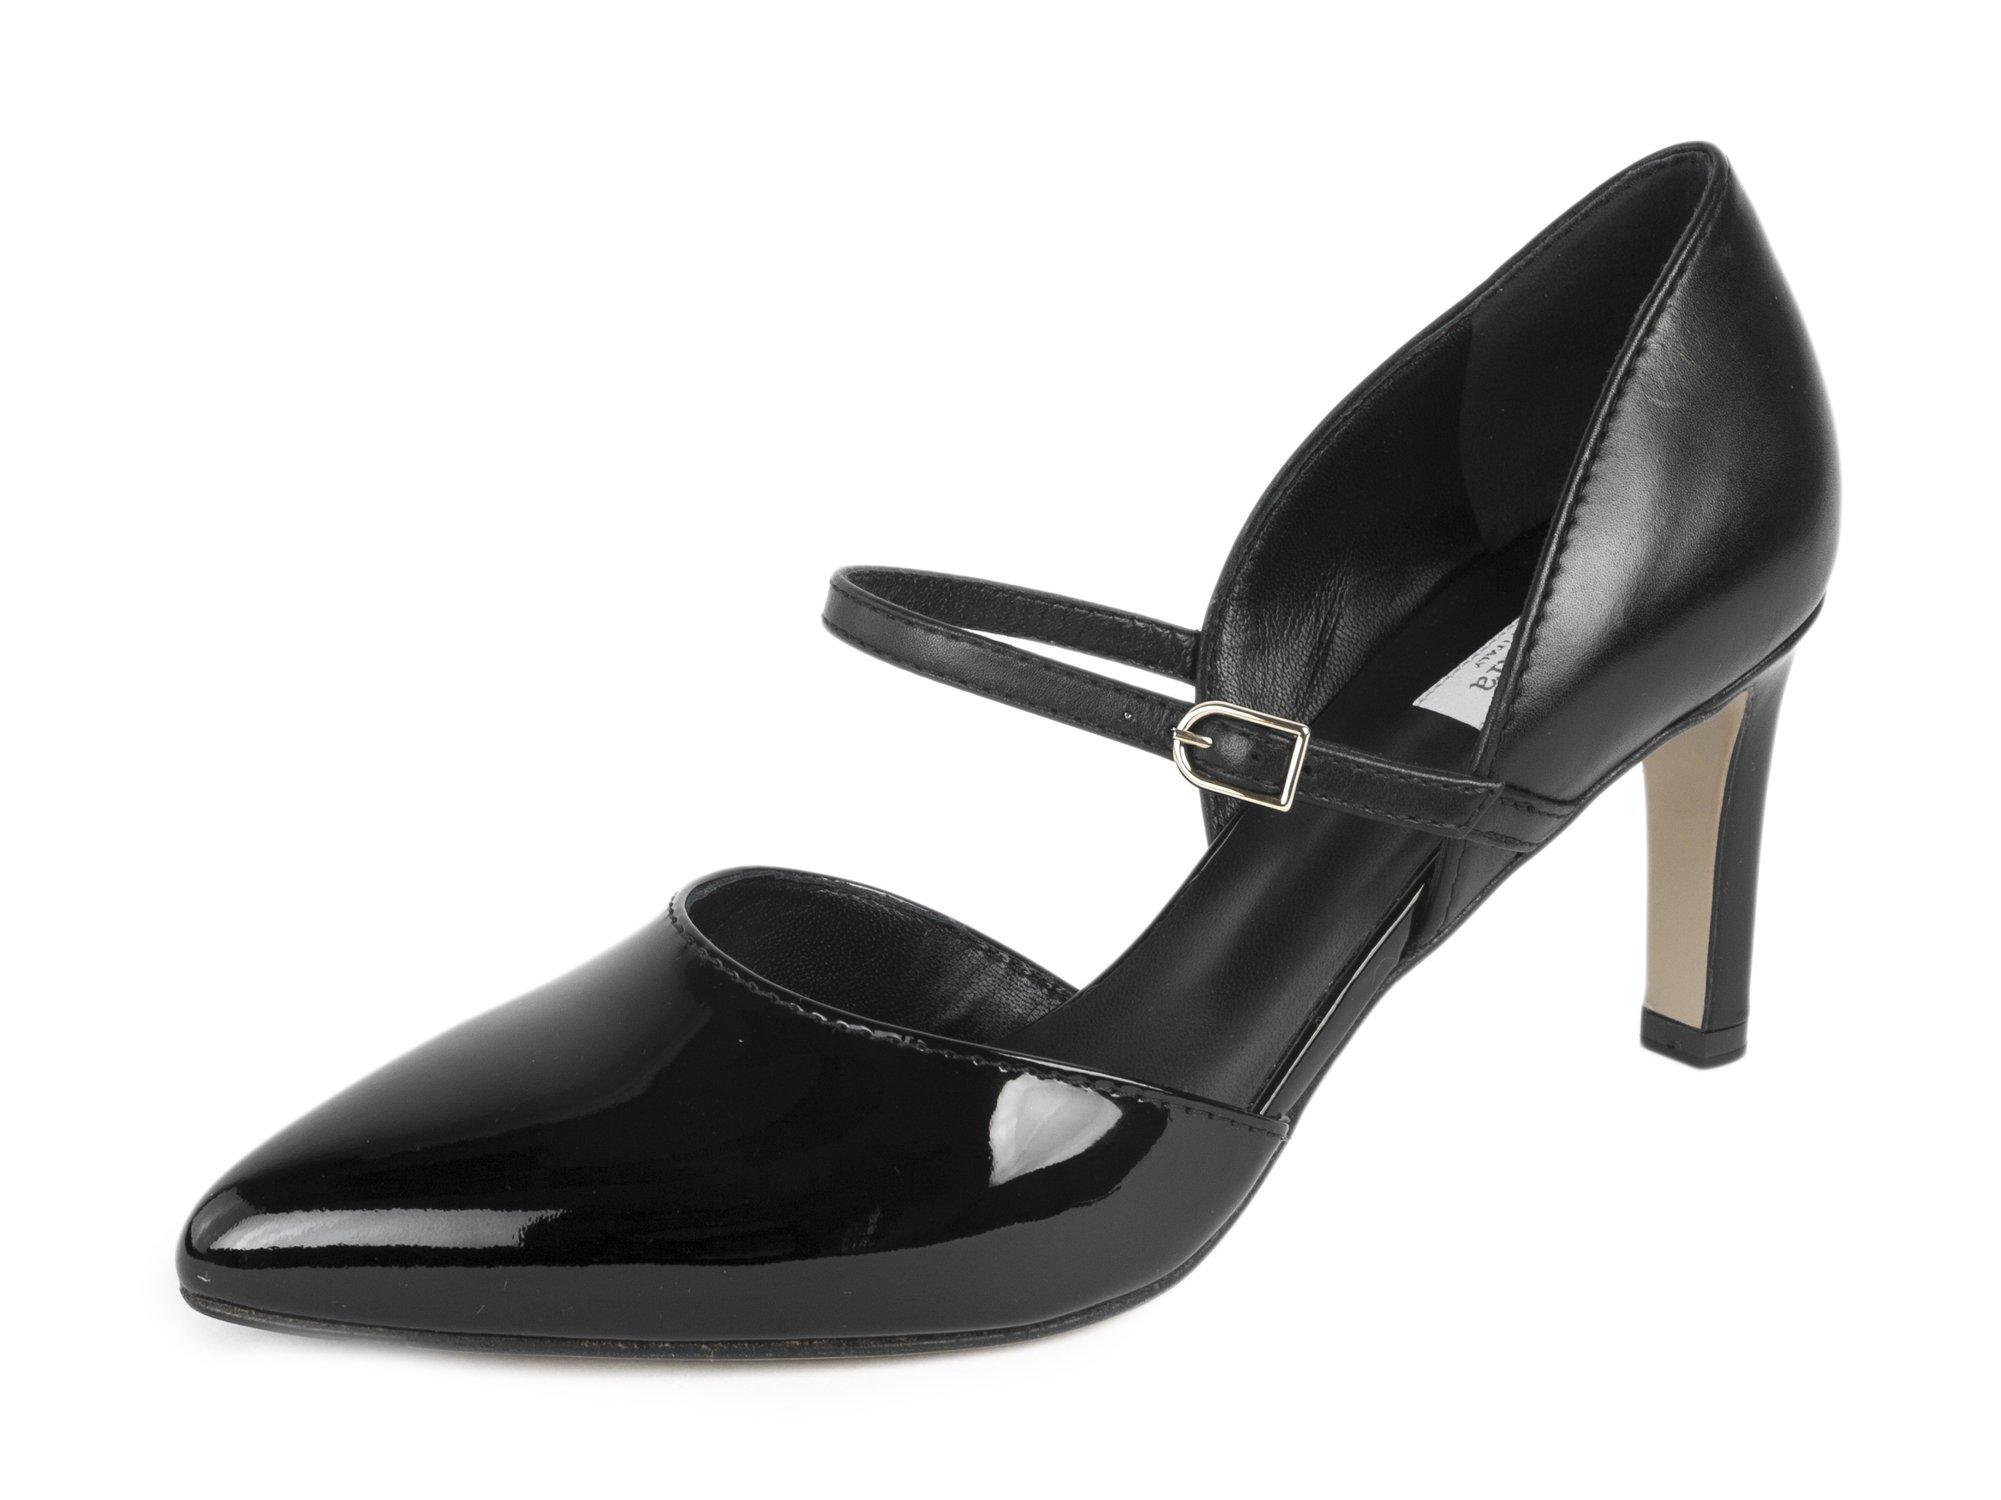 MaxMara Women's Lepant Mary Jane High Heels US 9/IT 39 Black